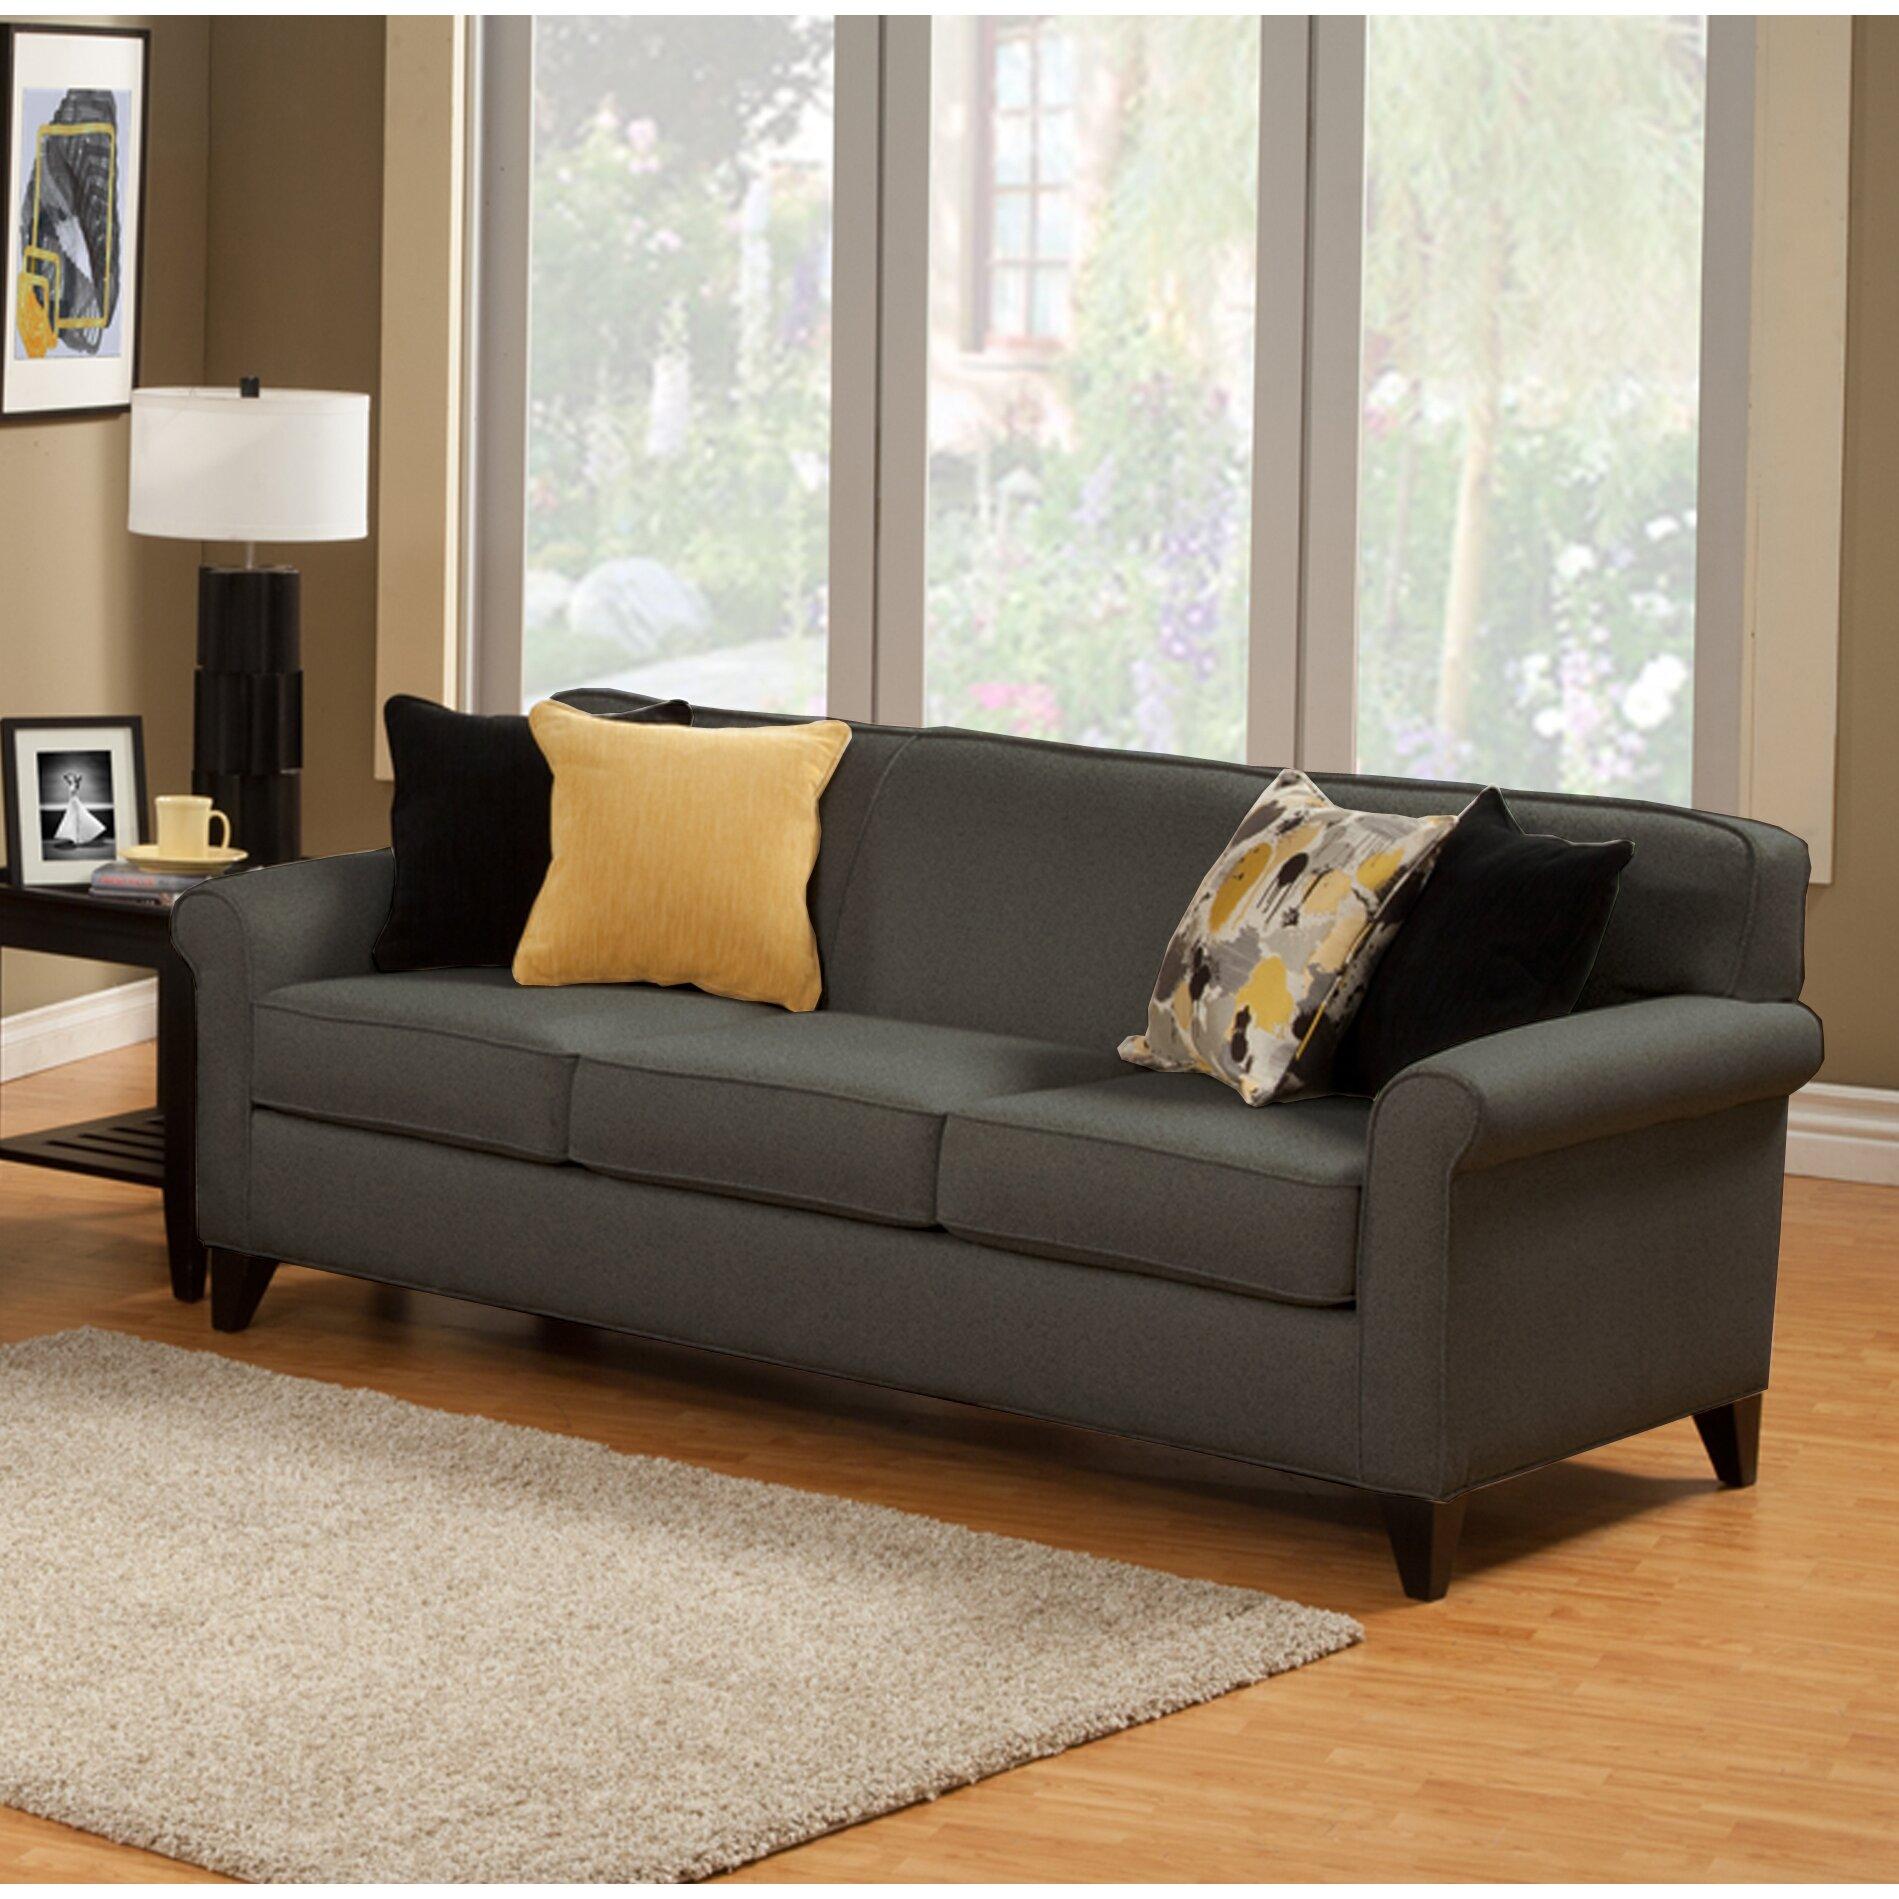 Hokku designs adalia living room collection for Hokku designs living room furniture